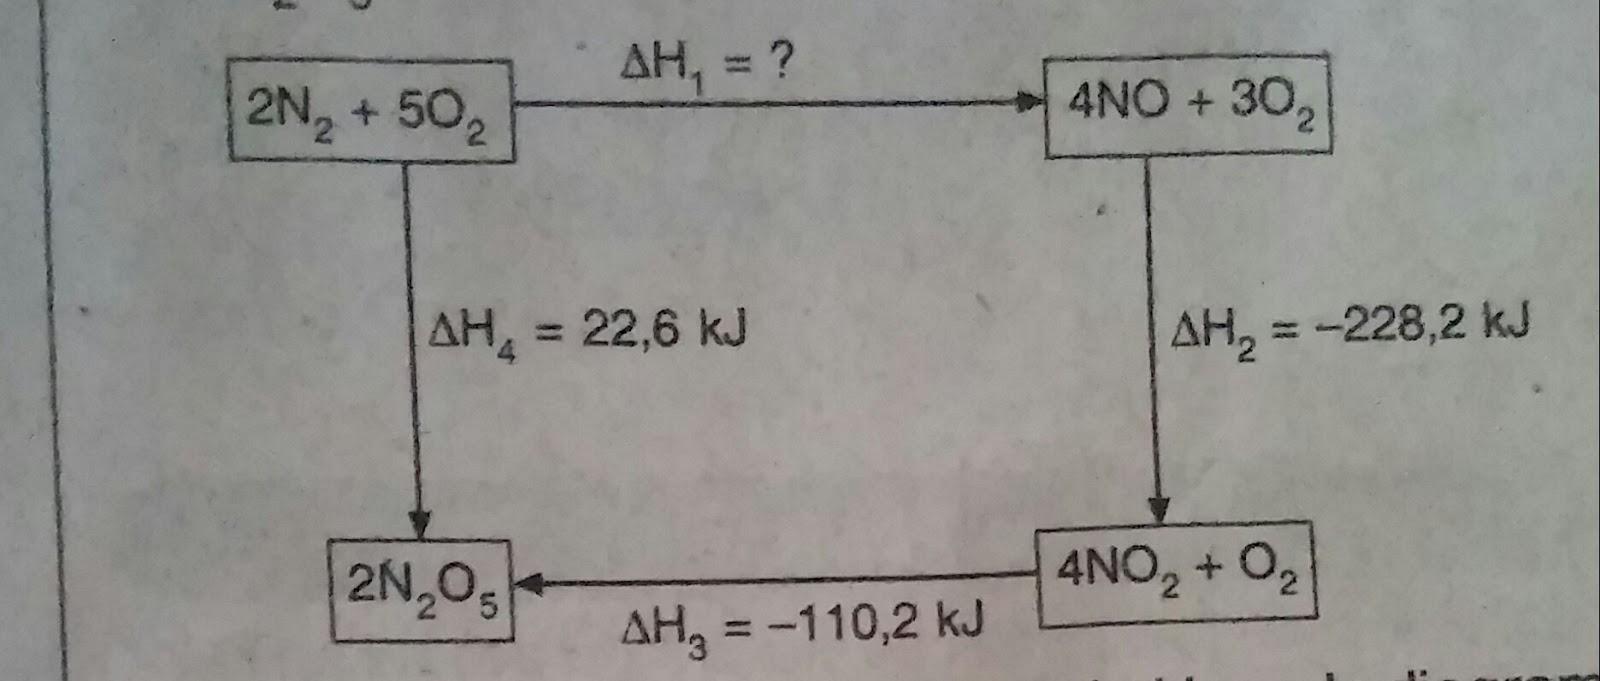 Soal pilihan ganda perubahan entalpi reaksi materi belajar berdasarkan hukum hess nilai pada diagram ccuart Choice Image